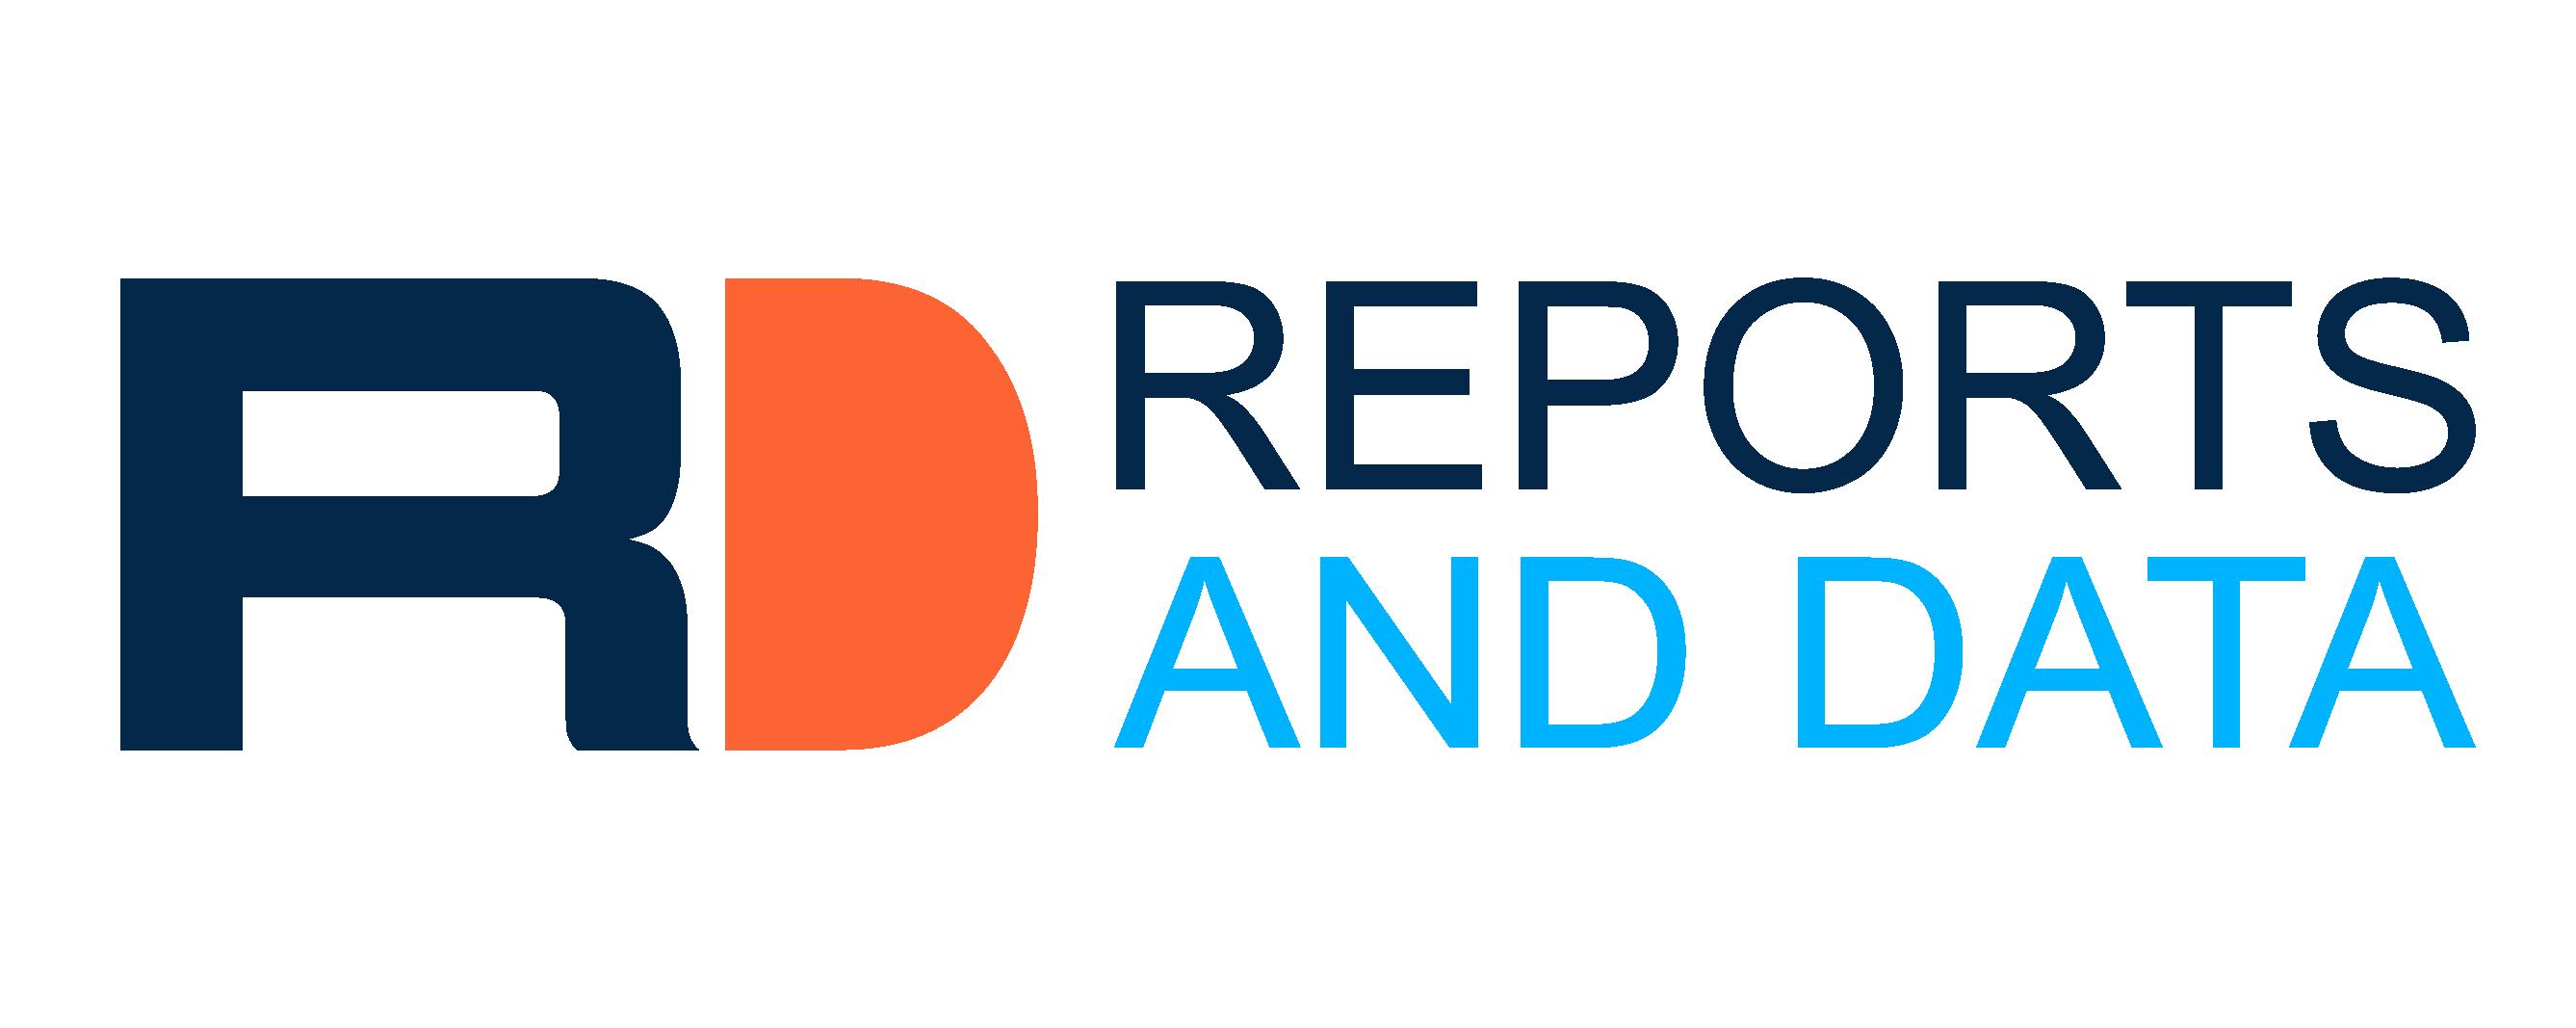 Amphoteric Surfactants Market Revenue & Demand Analysis (2019-2026): Top Key Players- BASF, Clariant AG, AkzoNobel N.V., Evonik Industries AG, Croda International PLC, Lonza